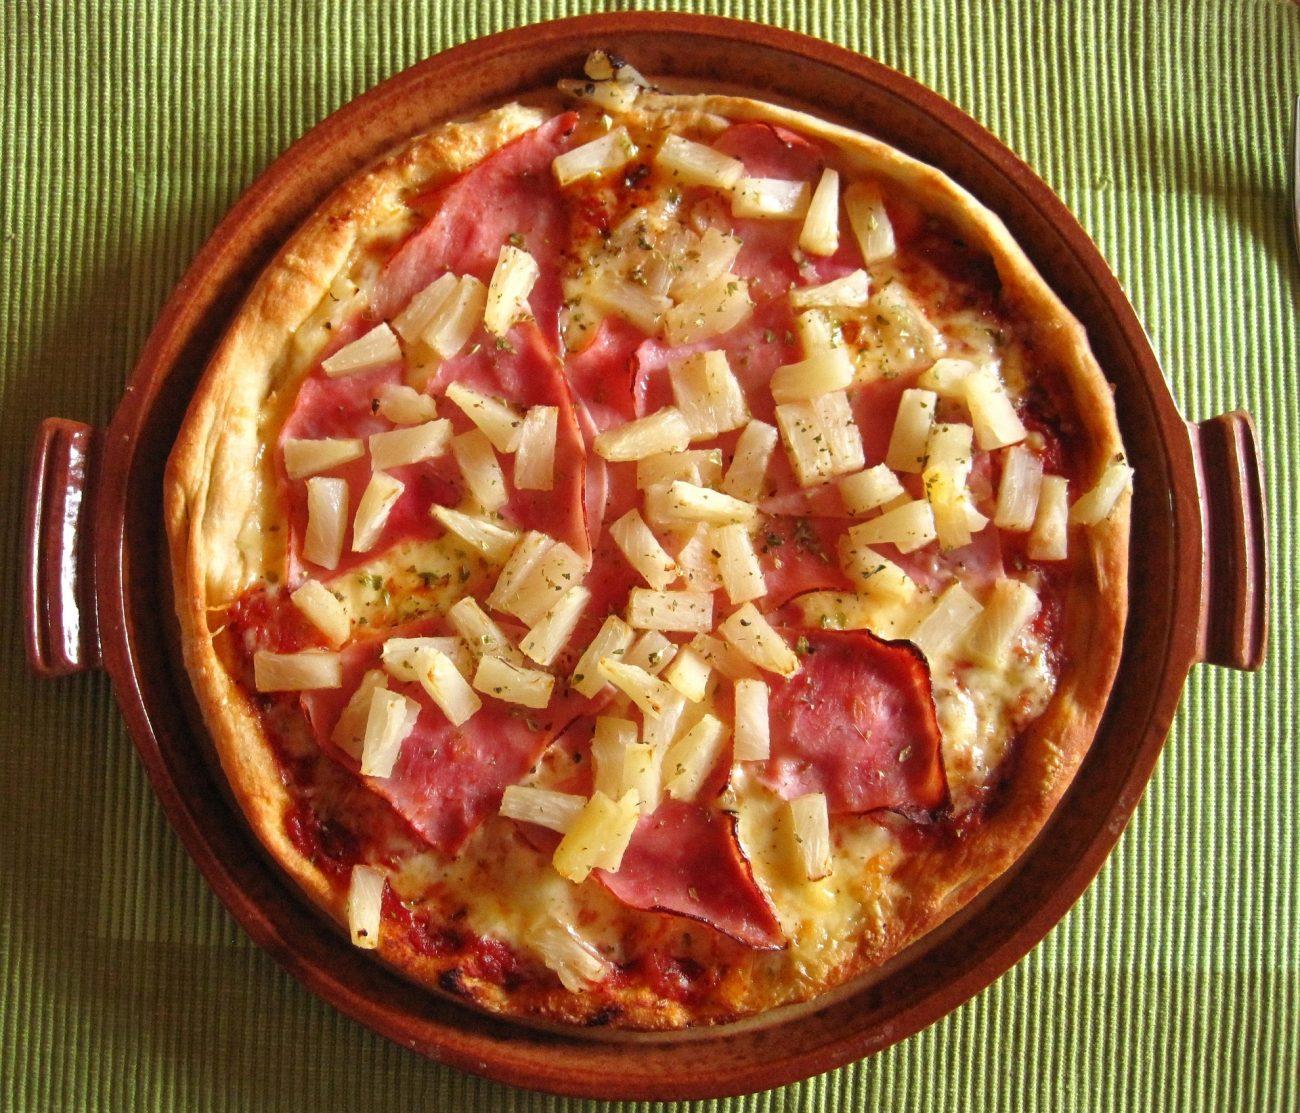 O grego Sam Panopoulos era dono de um restaurante no Canadá. Em 1962, ele criou o sabor de pizza havaiana, que coloca abacaxi e presunto na mesma pizza. O nome dela veio da marca da conserva de onde Panopoulos pegava a fruta. - Pixabay